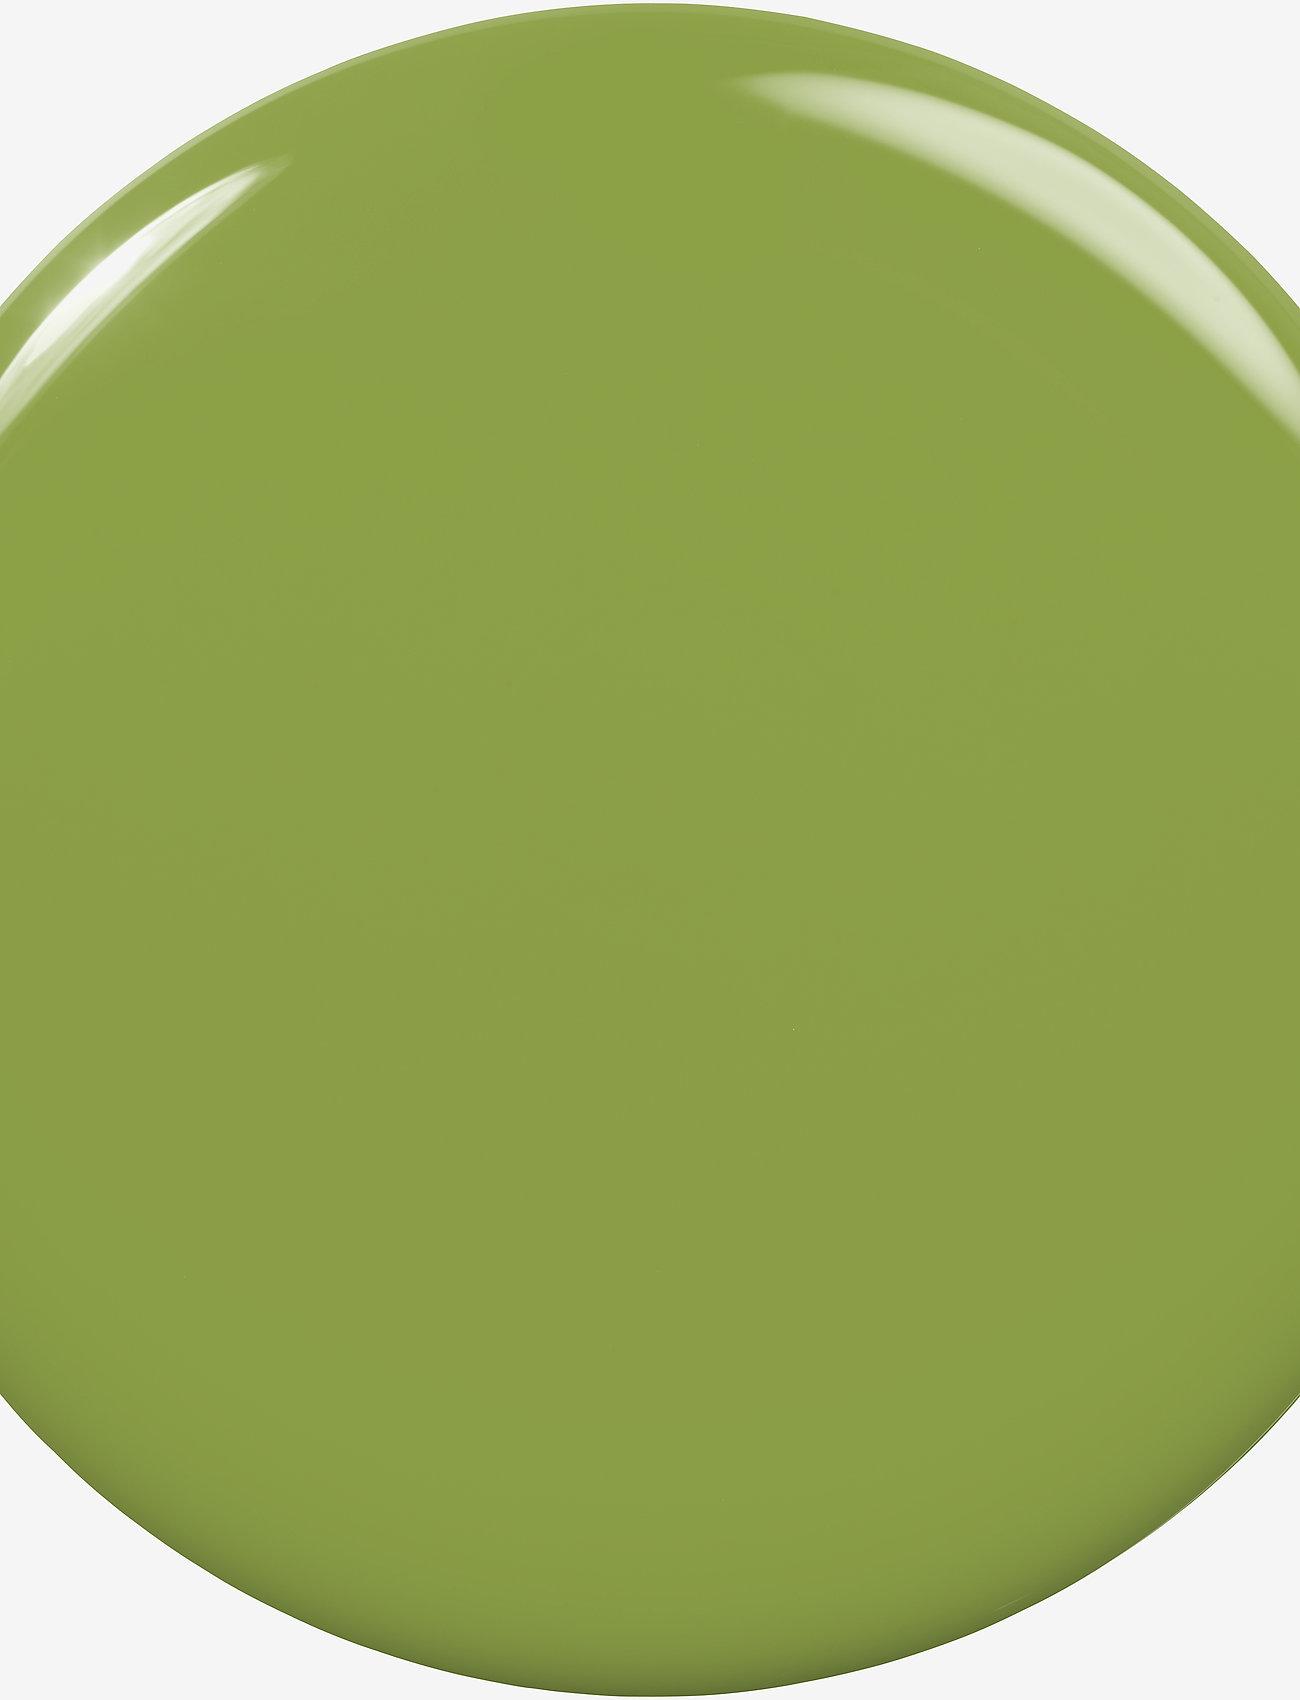 Essie - midsummer collection - neglelak - come on clover 724 - 1